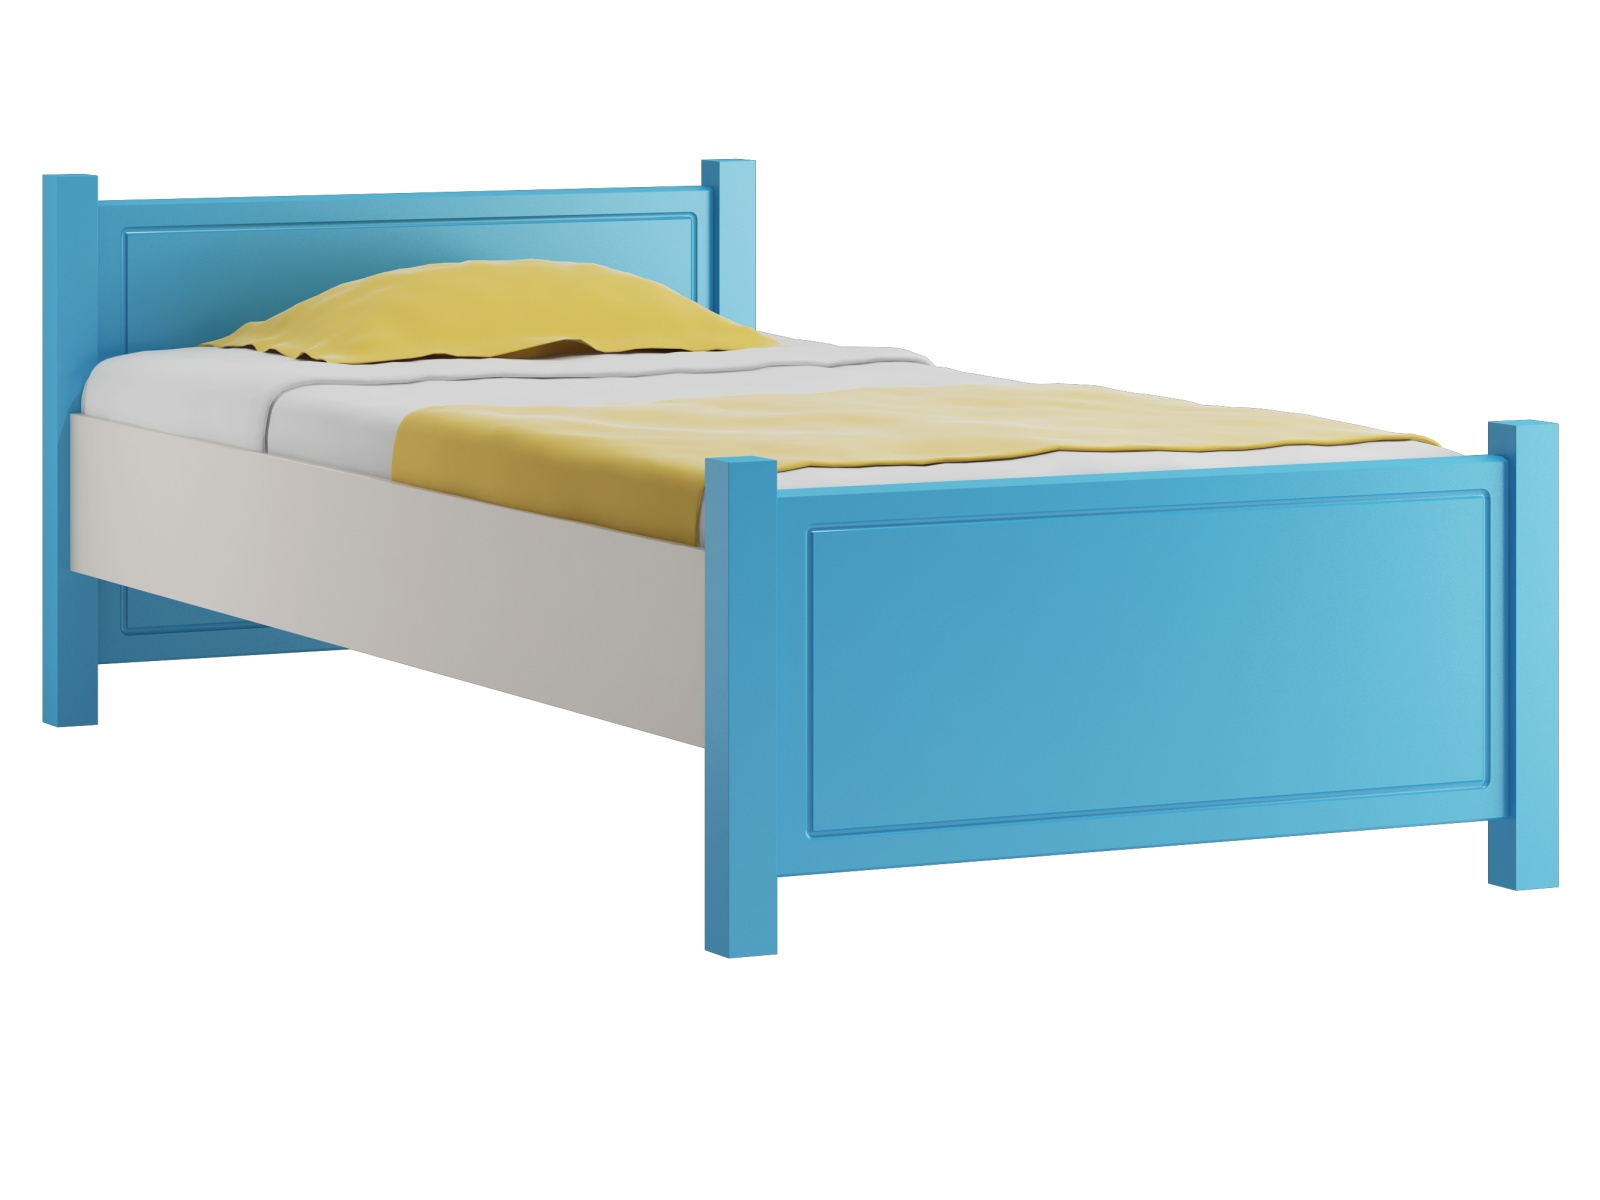 MAGNAT AMEKO postel 80x200 cm s roštem, masiv borovice